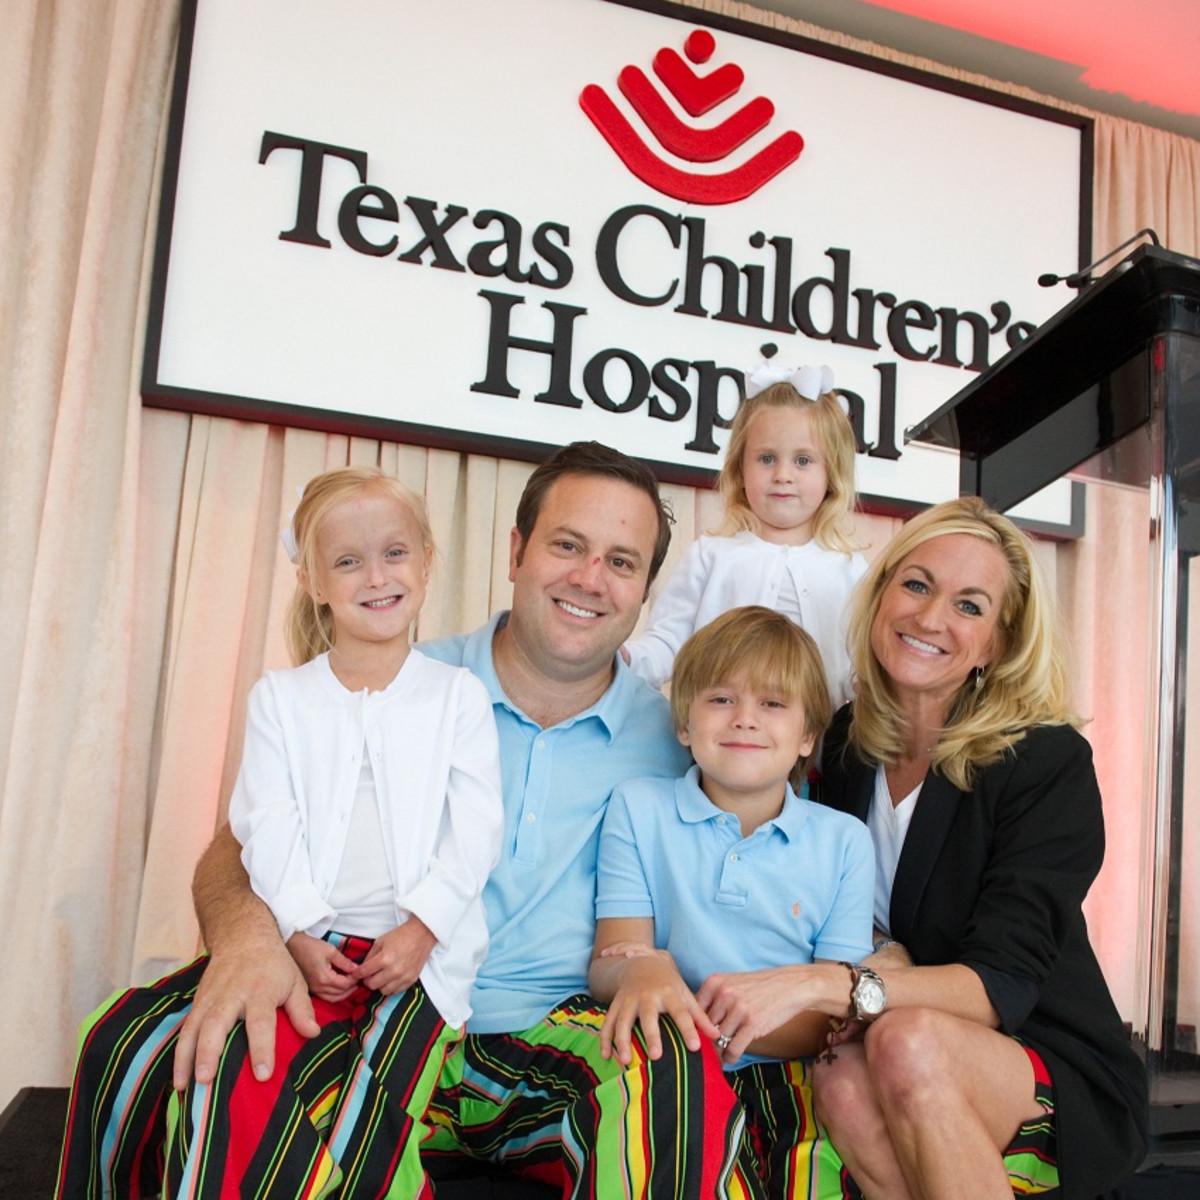 Levi Goode, Kelley Goode, Reese Goode, Mason Goode, Vivian Goode, Texas Children's Hospital, Bad Pants Fashion Show